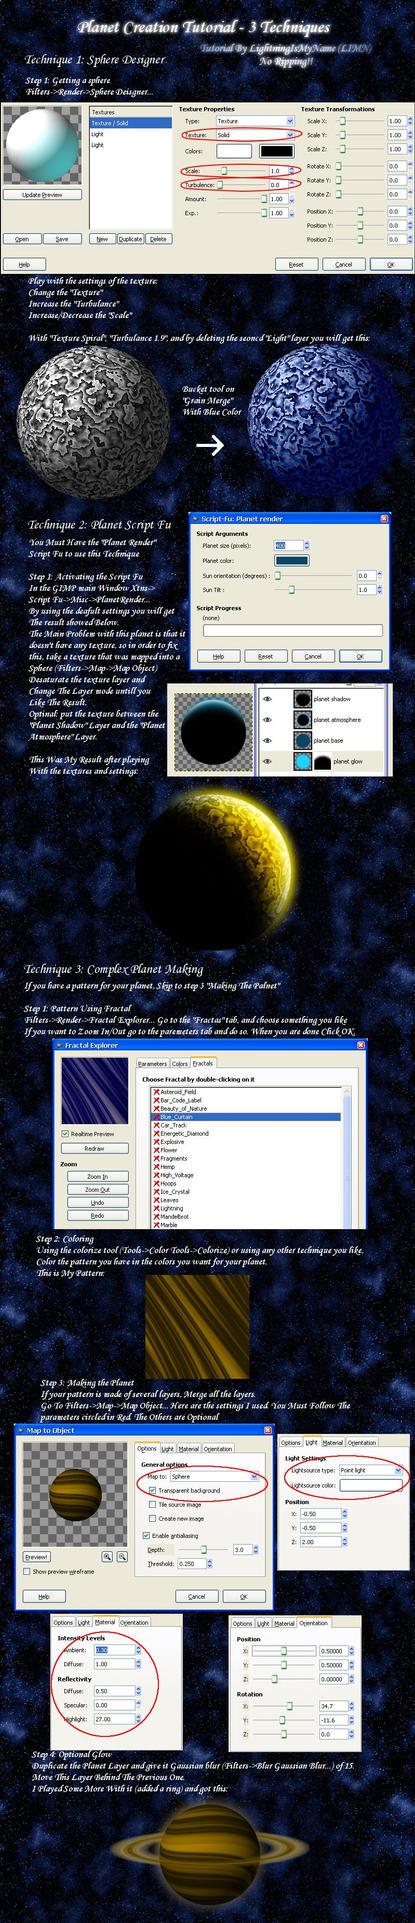 Planet Tutorial for GIMP by LightningIsMyName